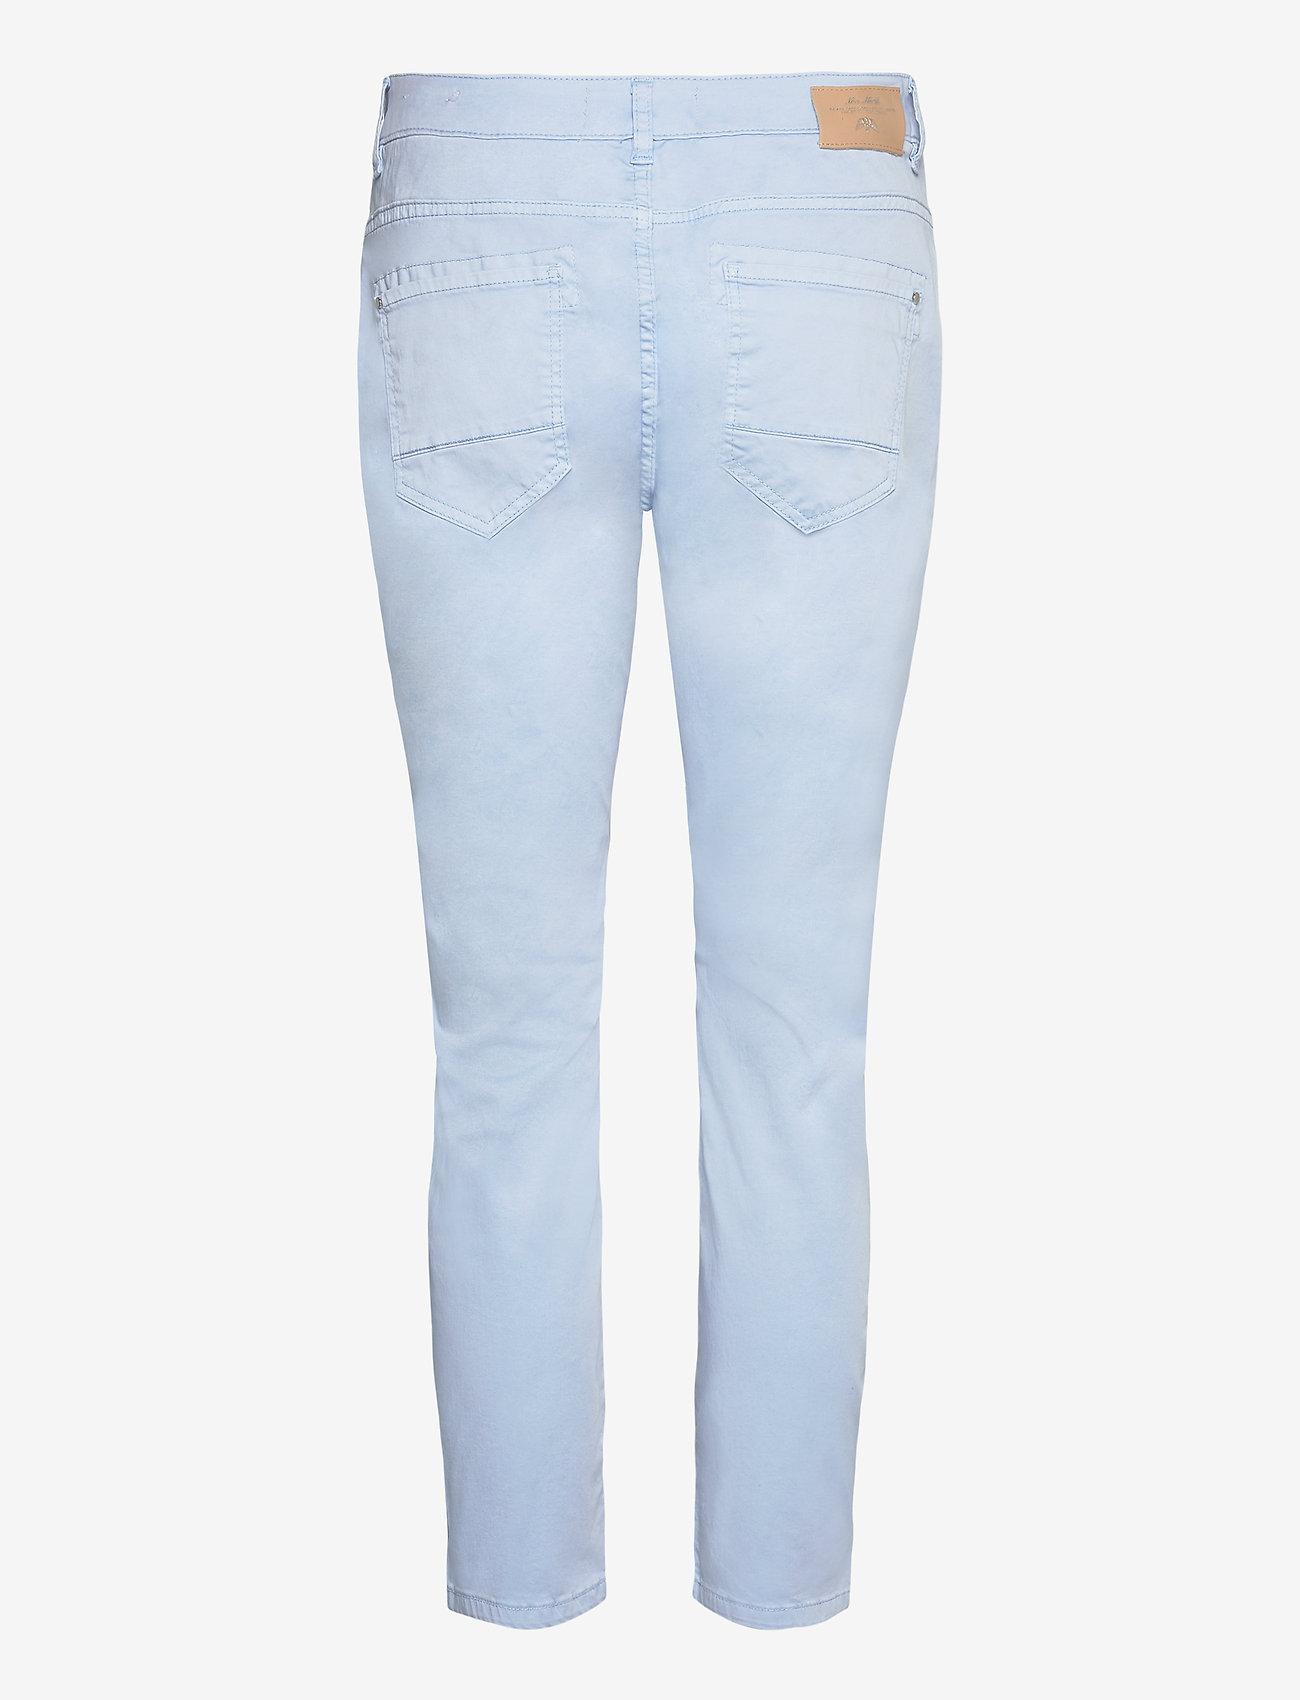 MOS MOSH - Etta Relic Pant - chinos - chambray blue - 1